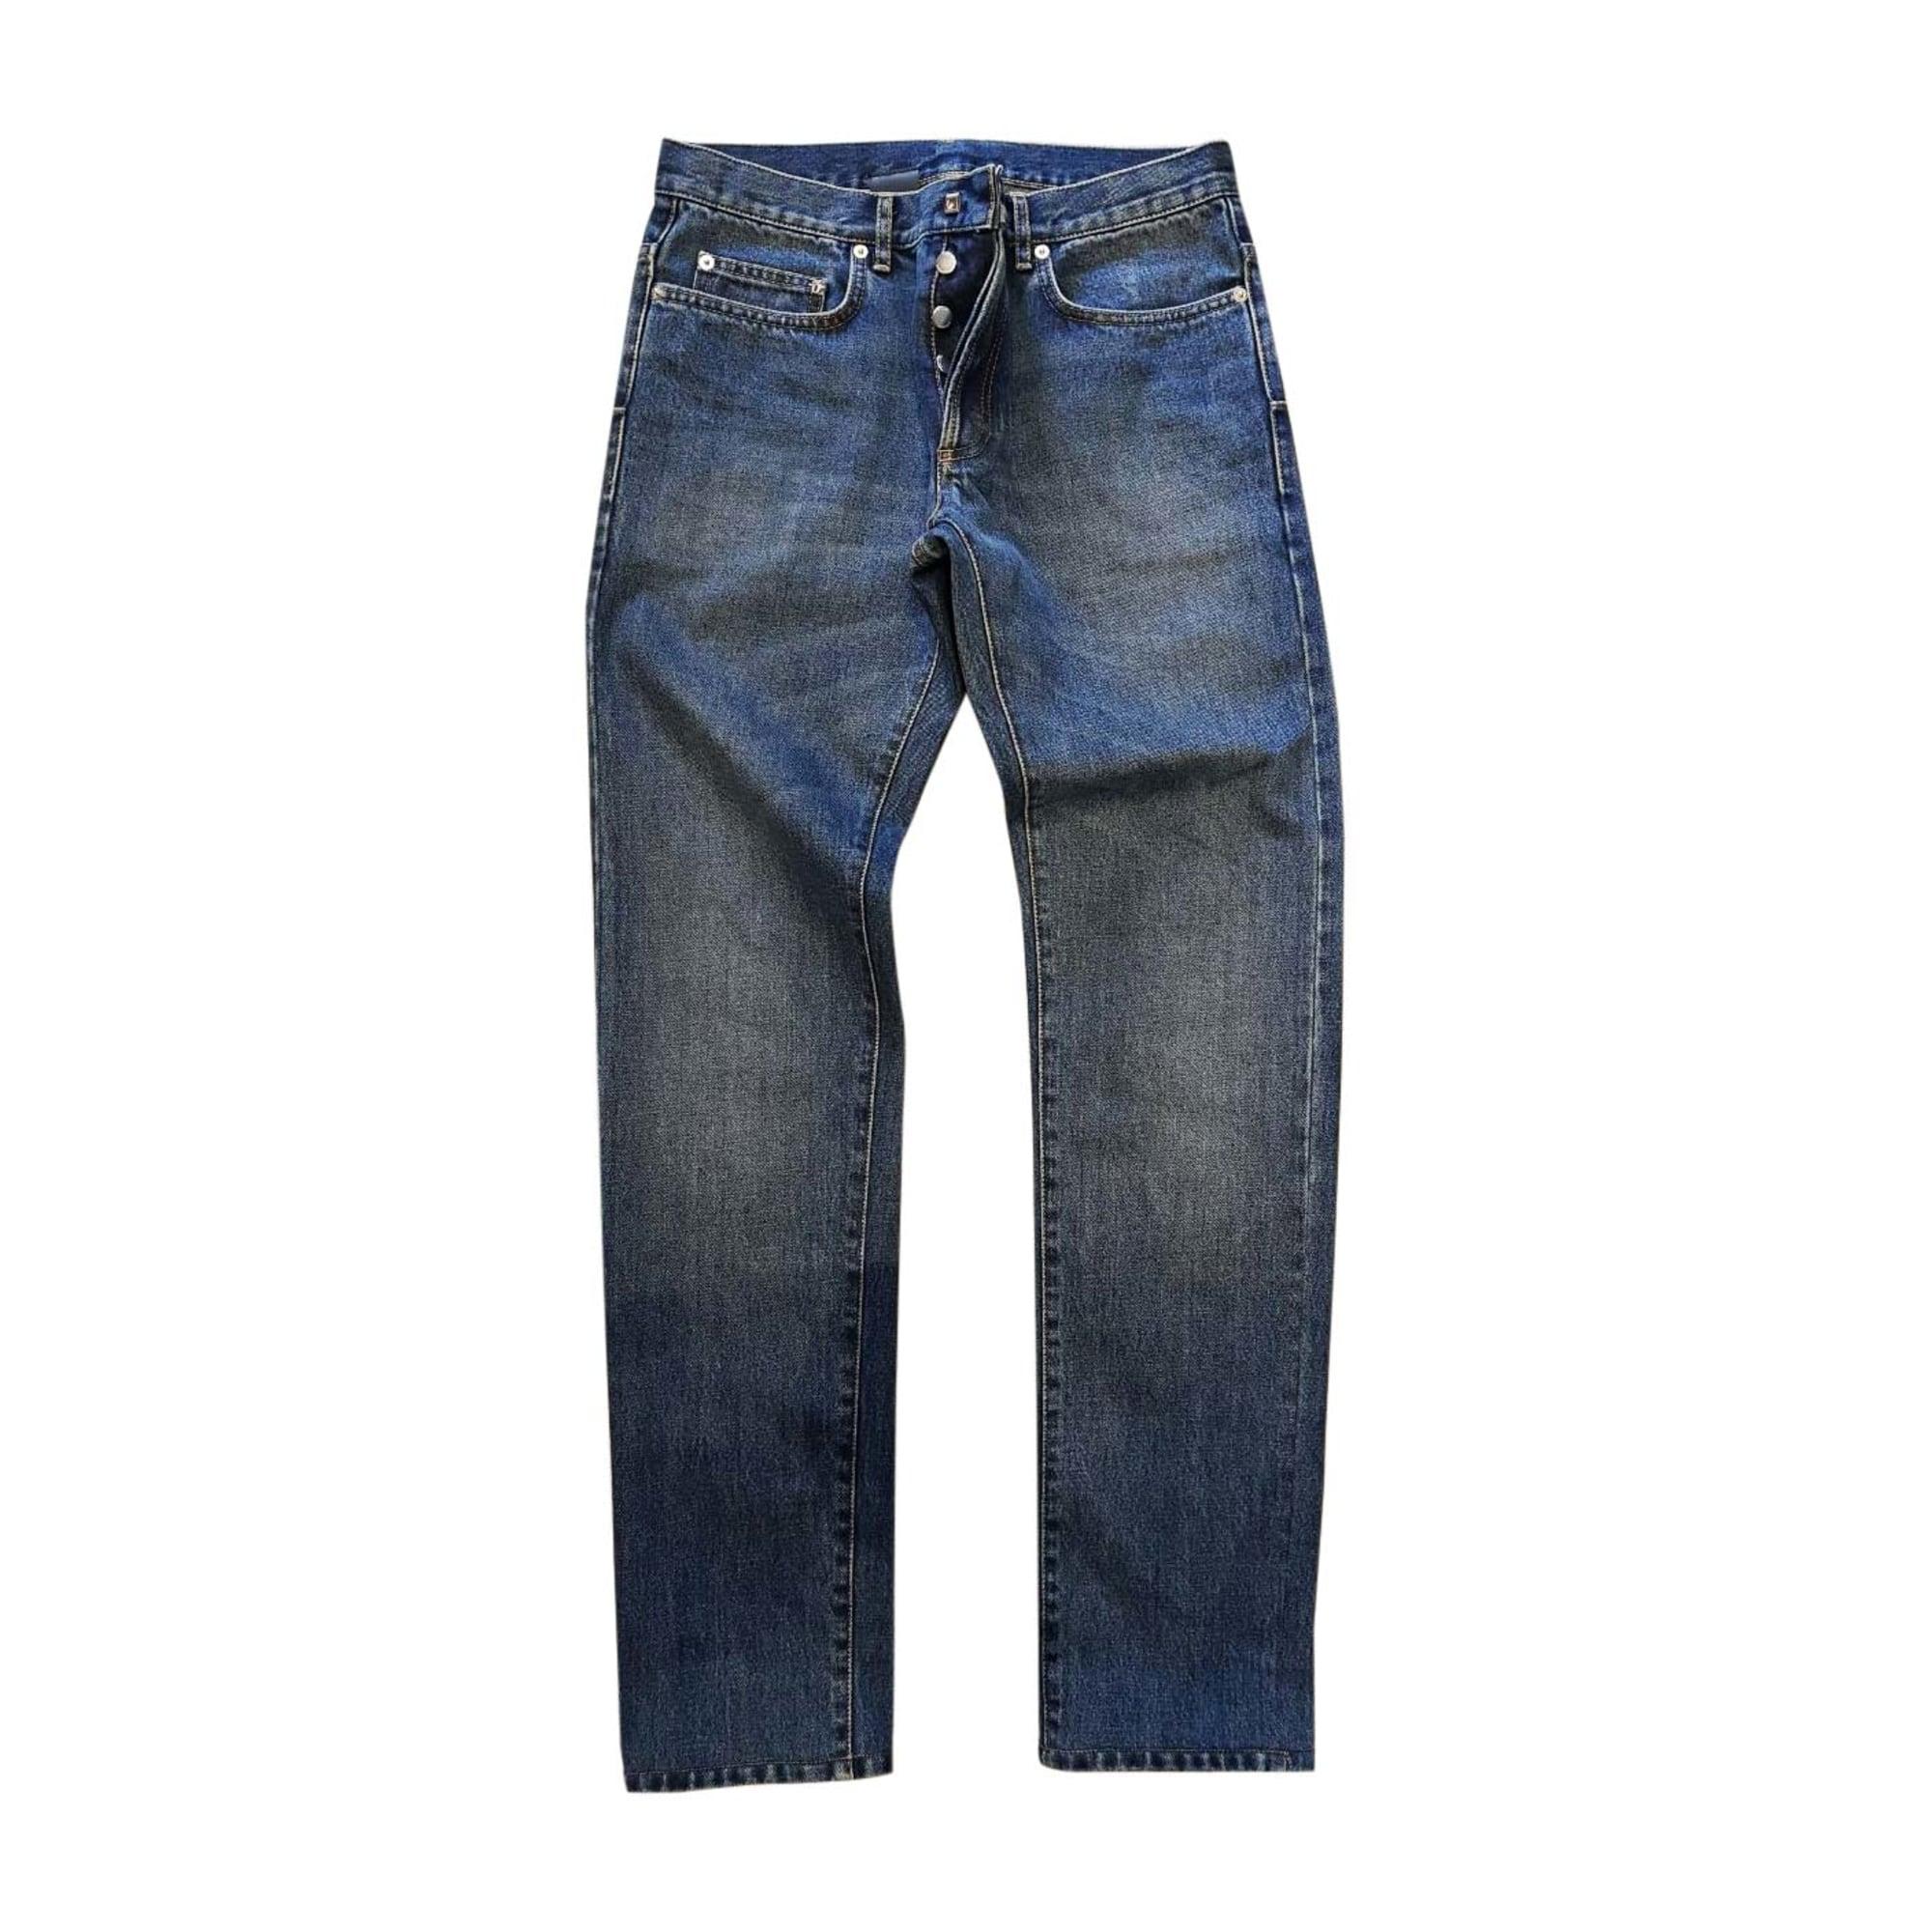 Jeans slim DIOR HOMME Bleu, bleu marine, bleu turquoise